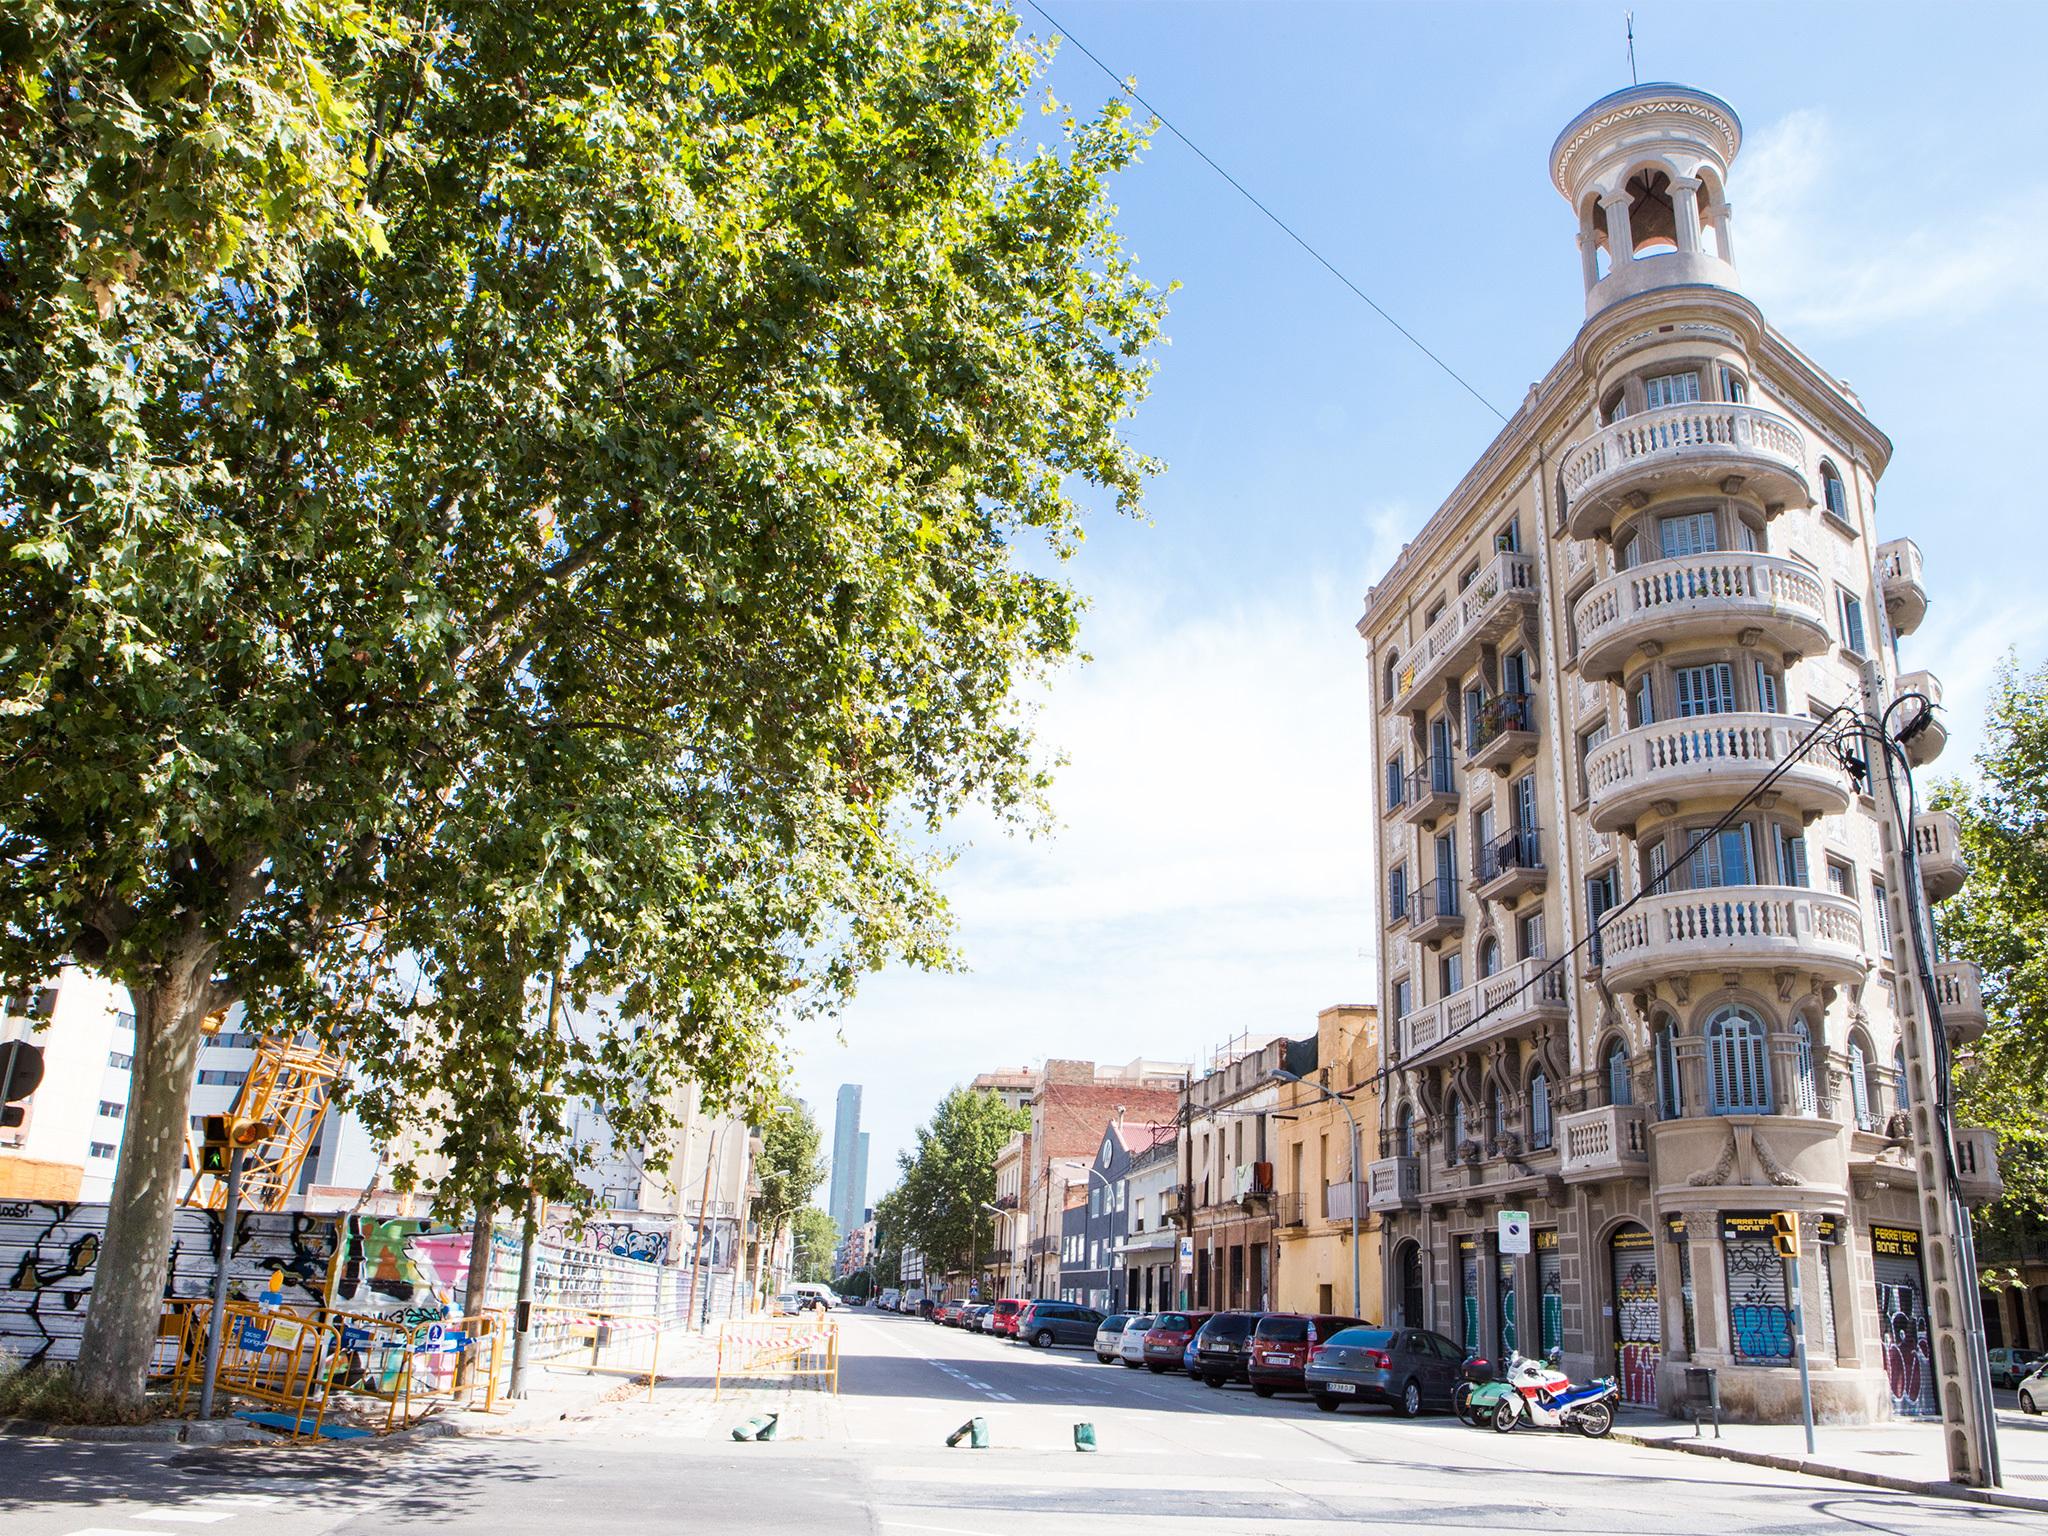 Pere IV, Barcelona streets